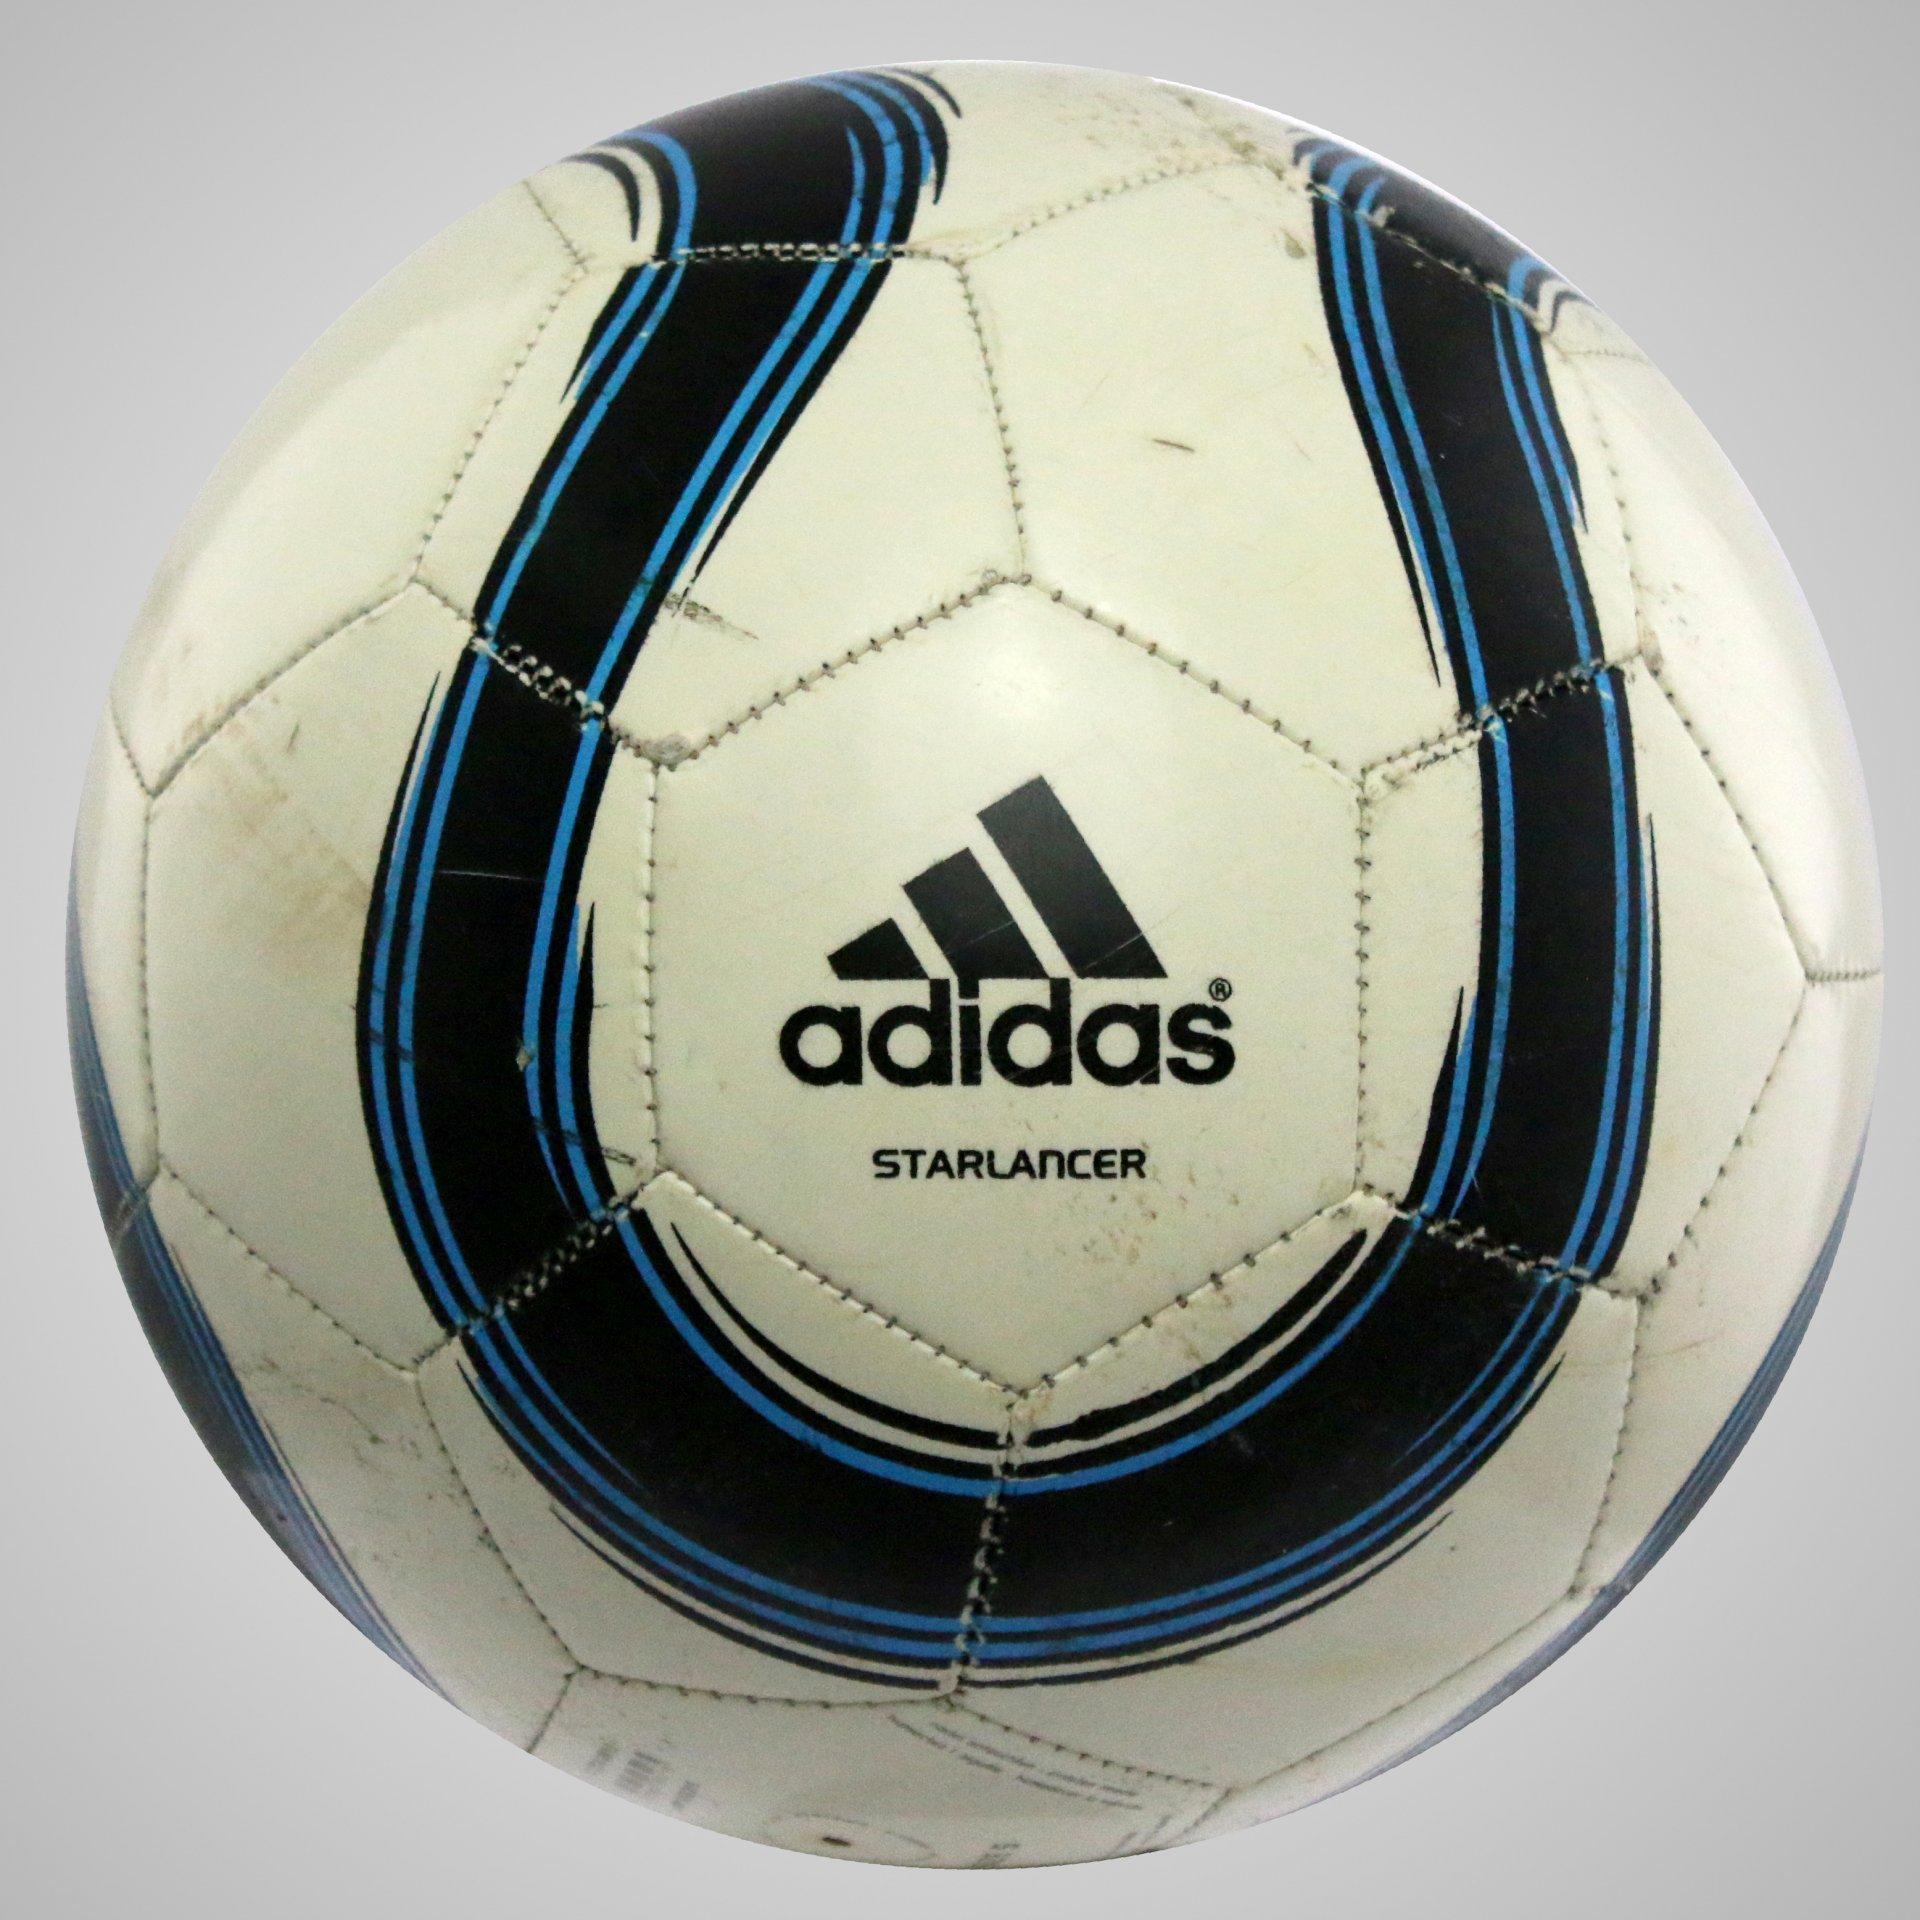 Adidas Starlancer